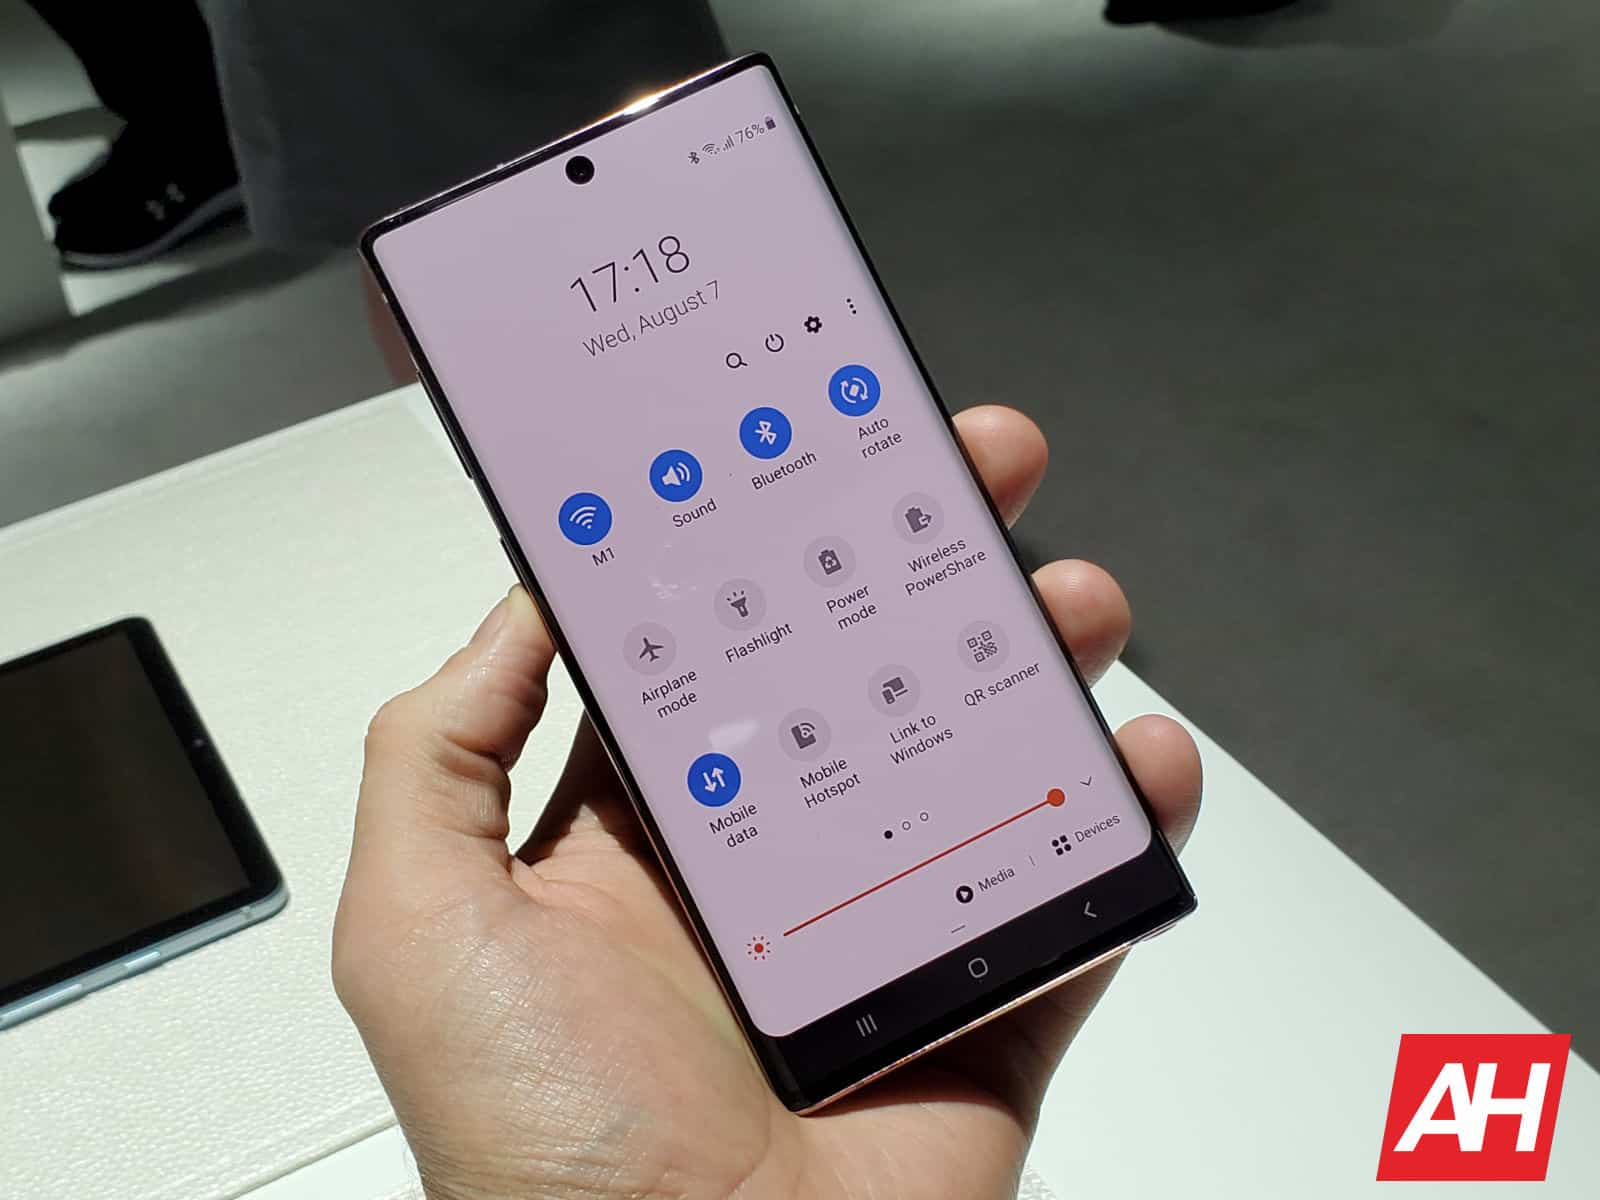 Samsung Galaxy Note 10 AH 2019 7